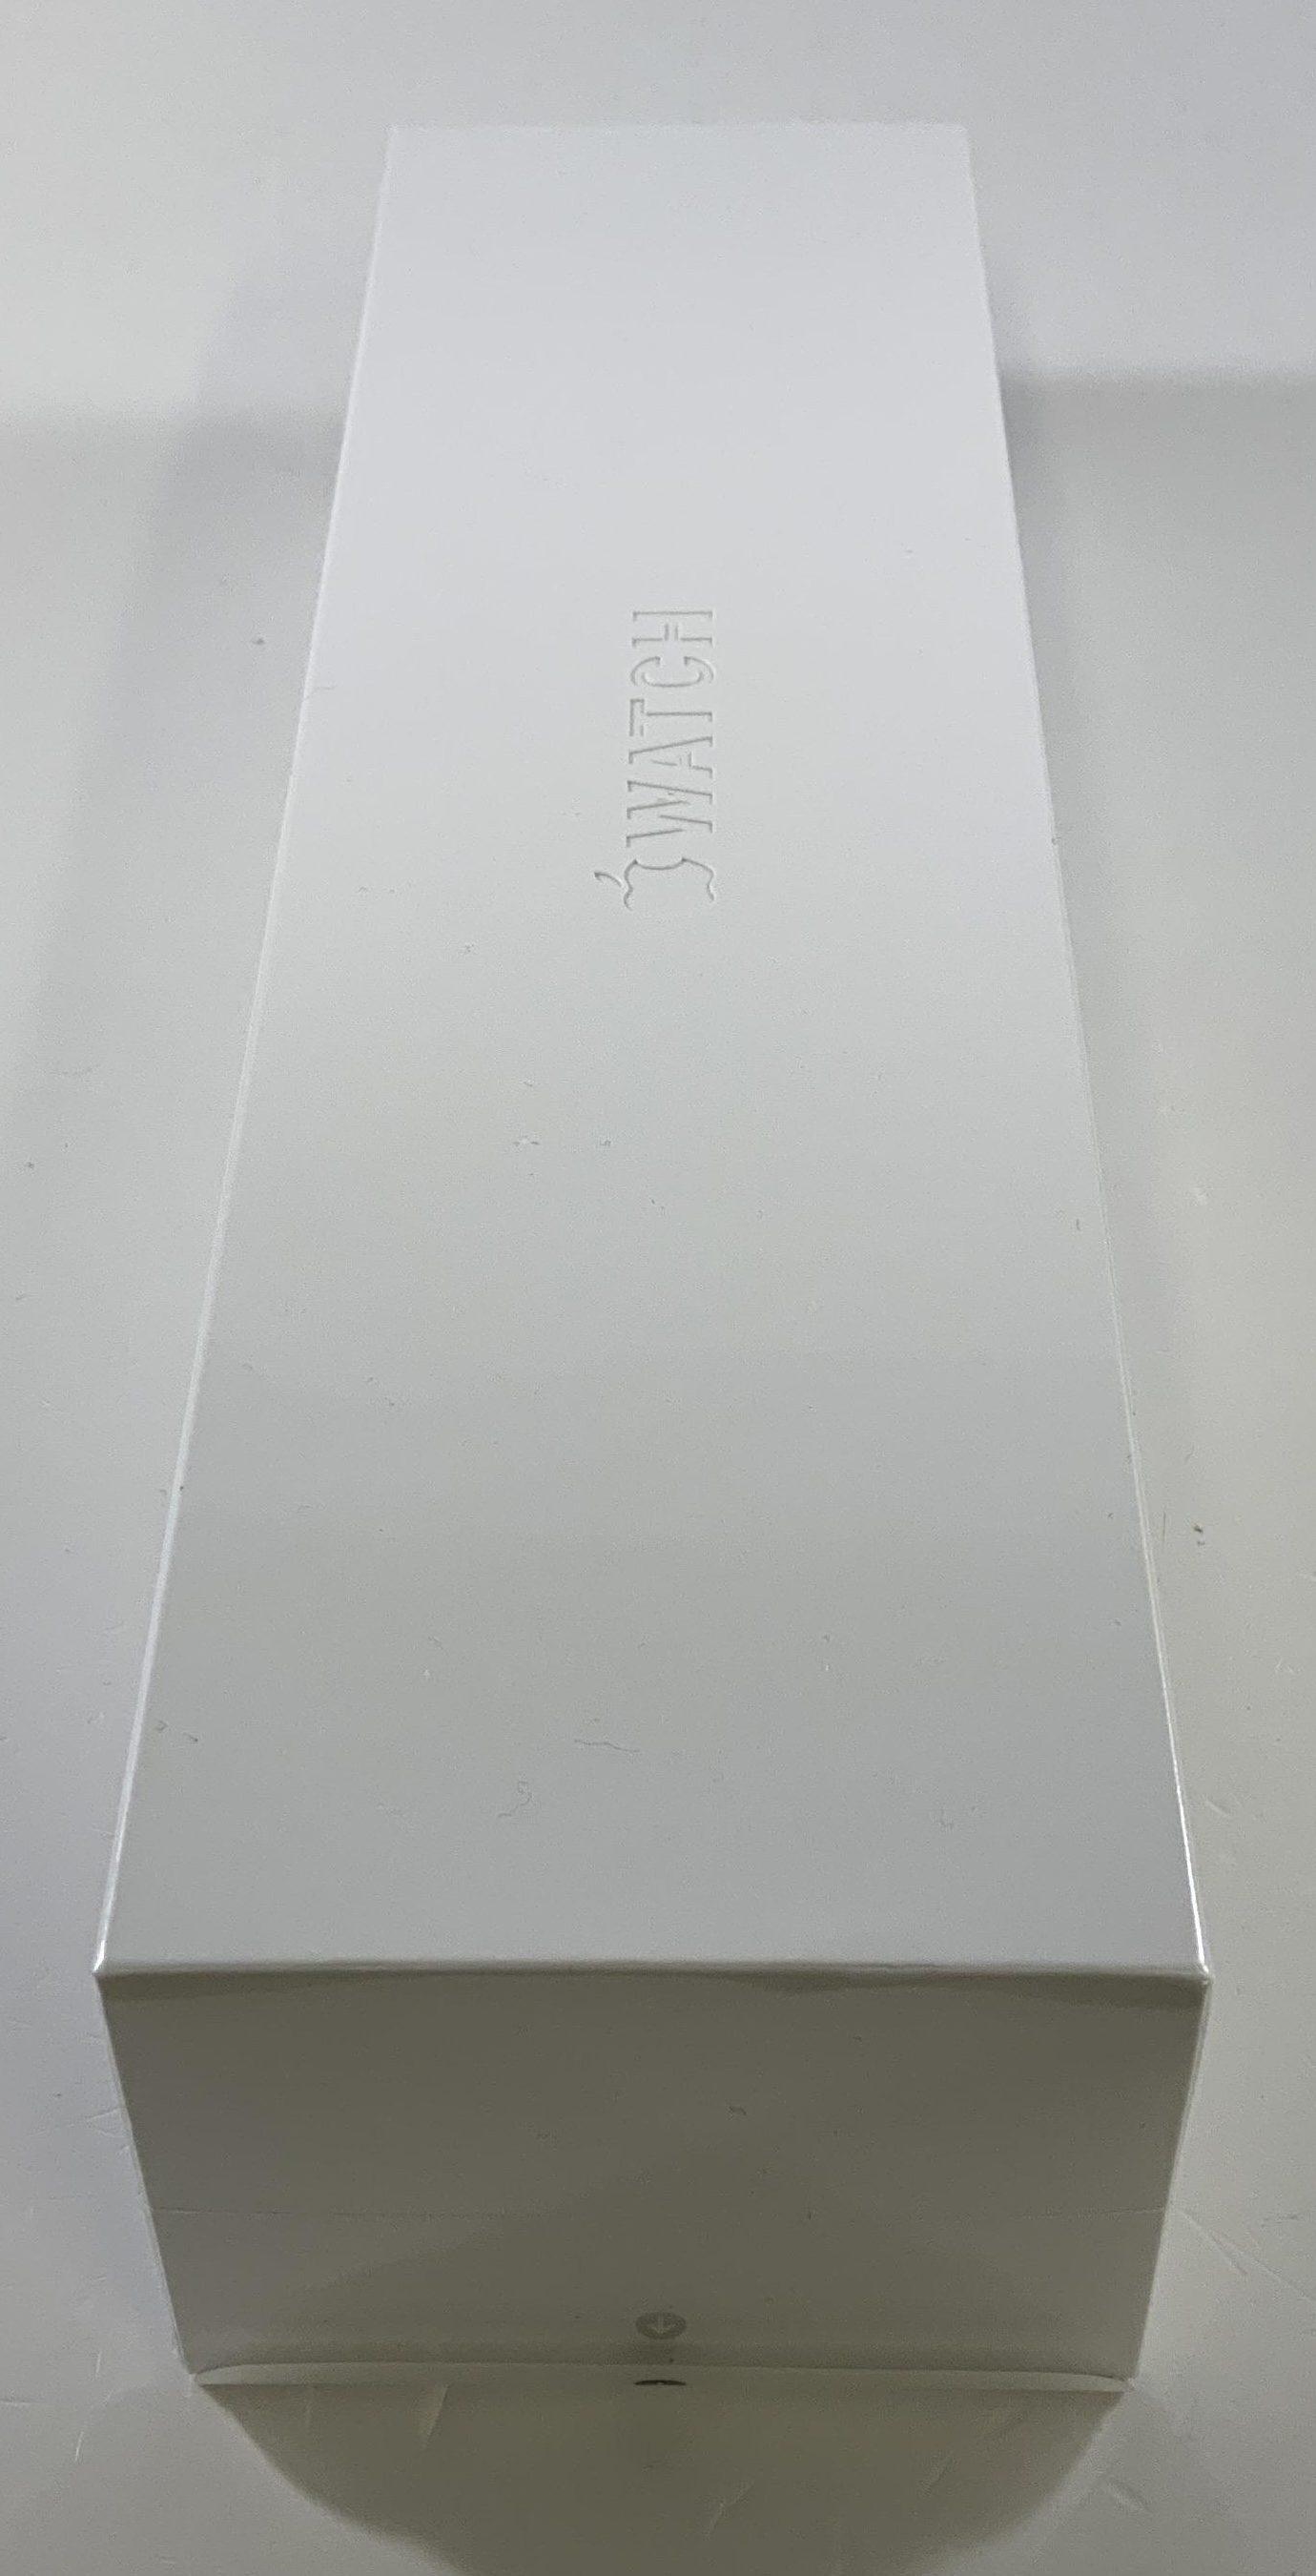 Watch Series 5 Steel Cellular (40mm), Space Black, Kuva 1